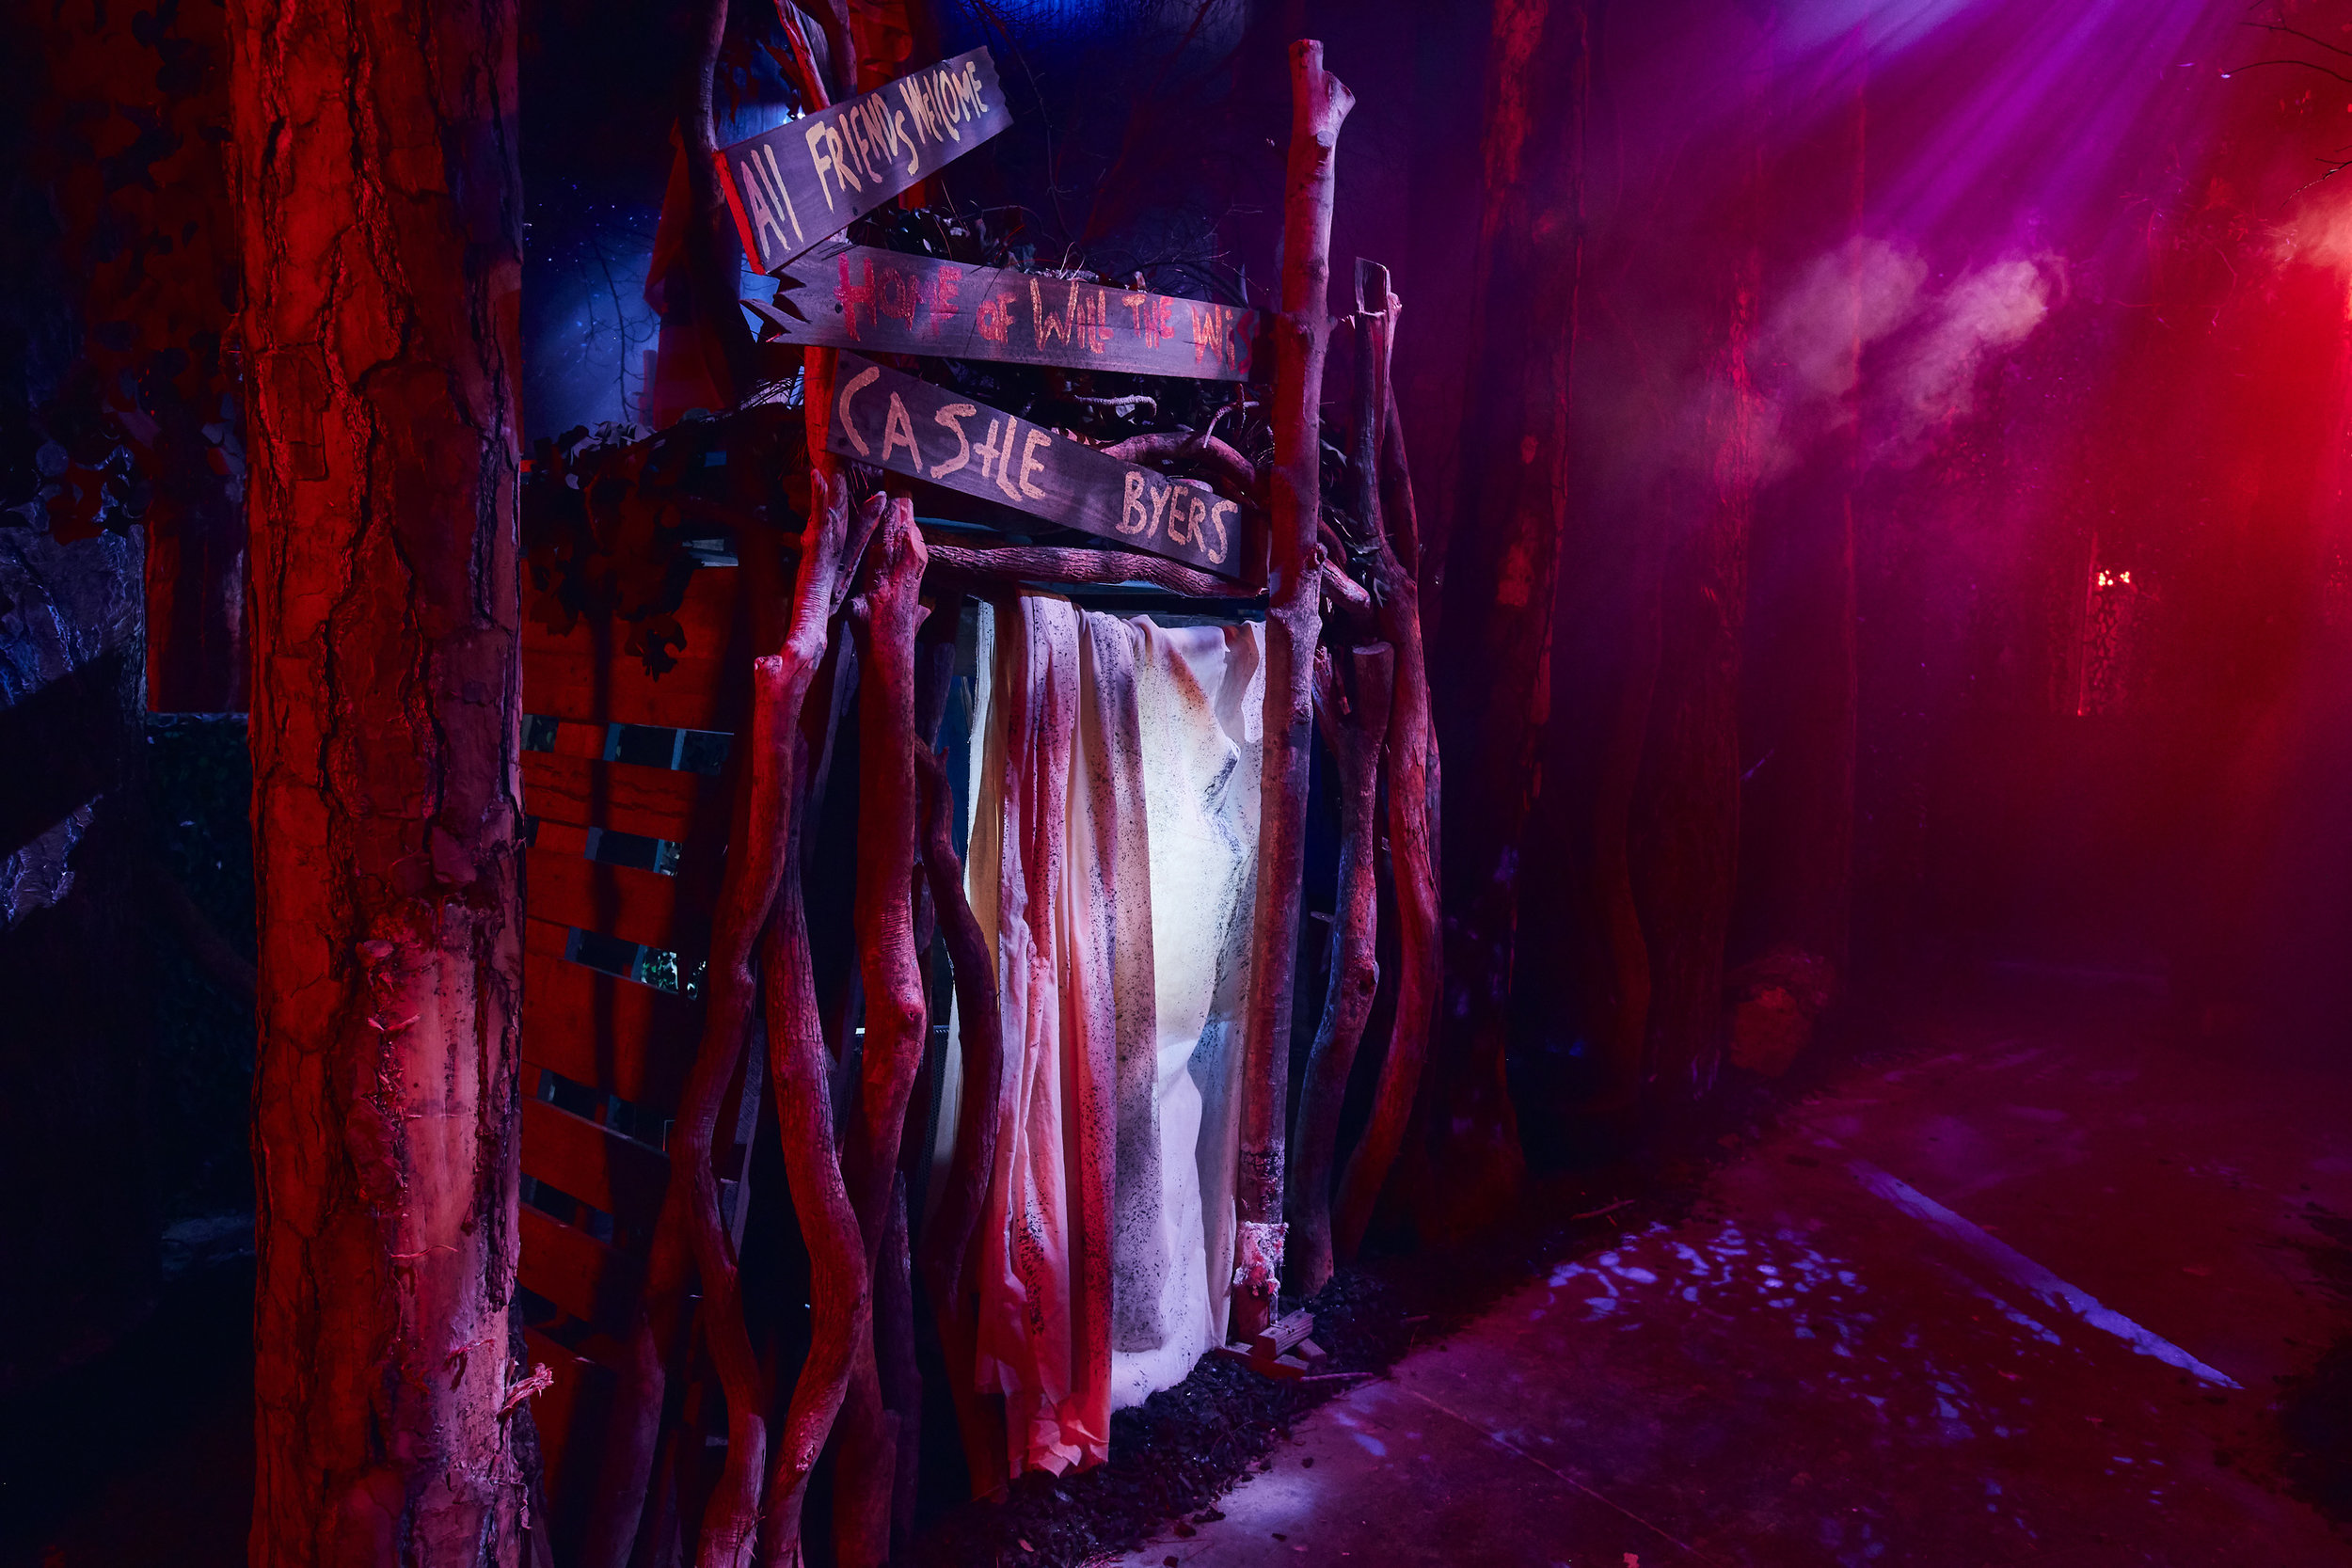 4_First Look Inside Stranger Things maze at HHN 2018.jpg